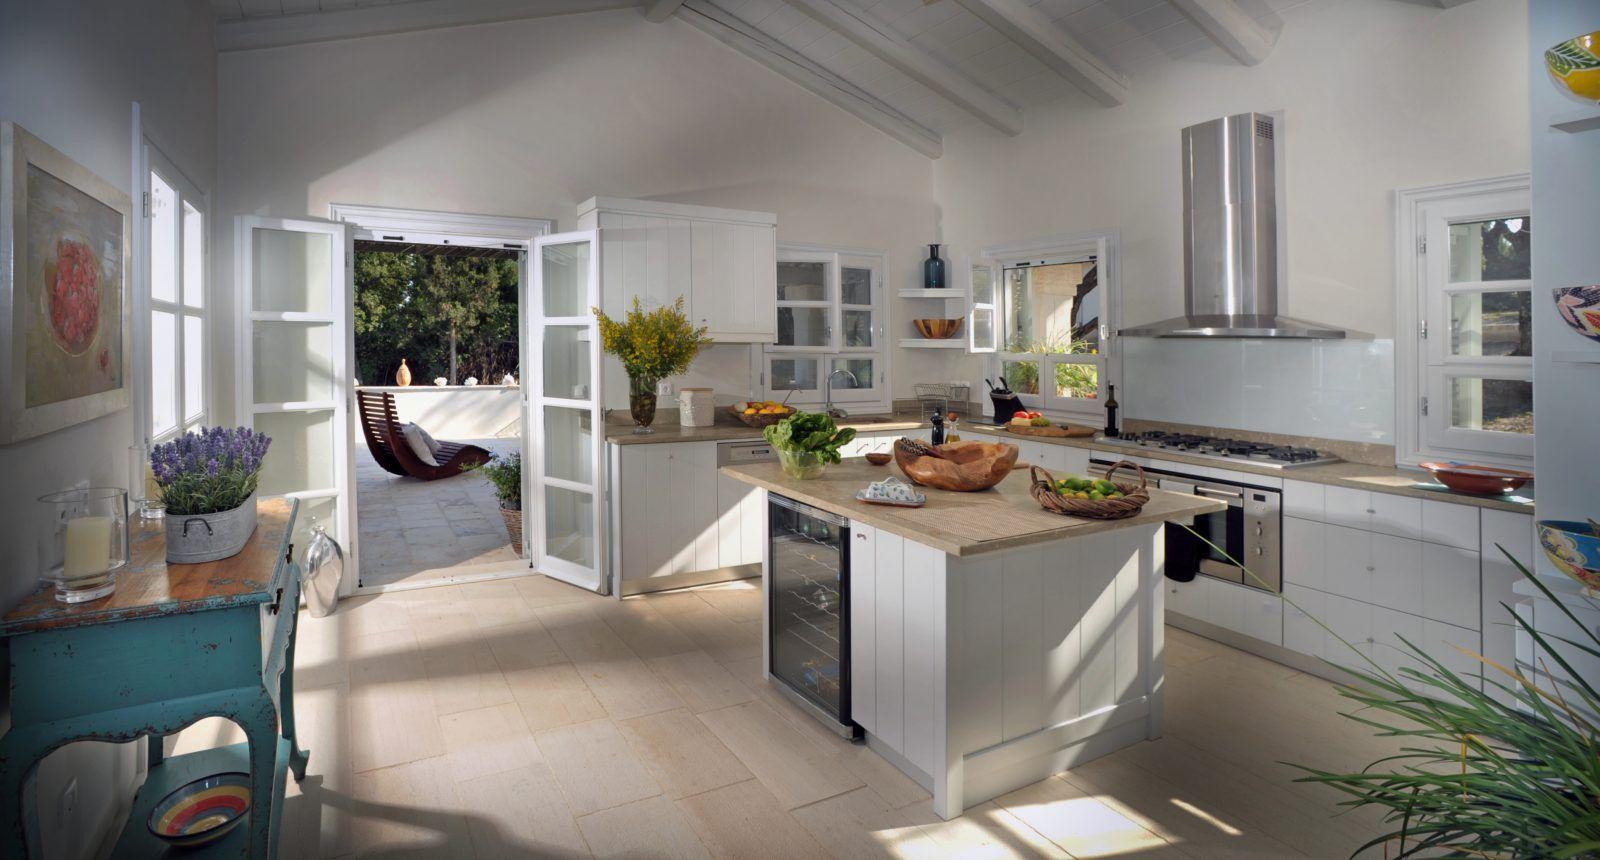 Villas • Luxury villa near Avlaki, Corfu • Greece • sleeps